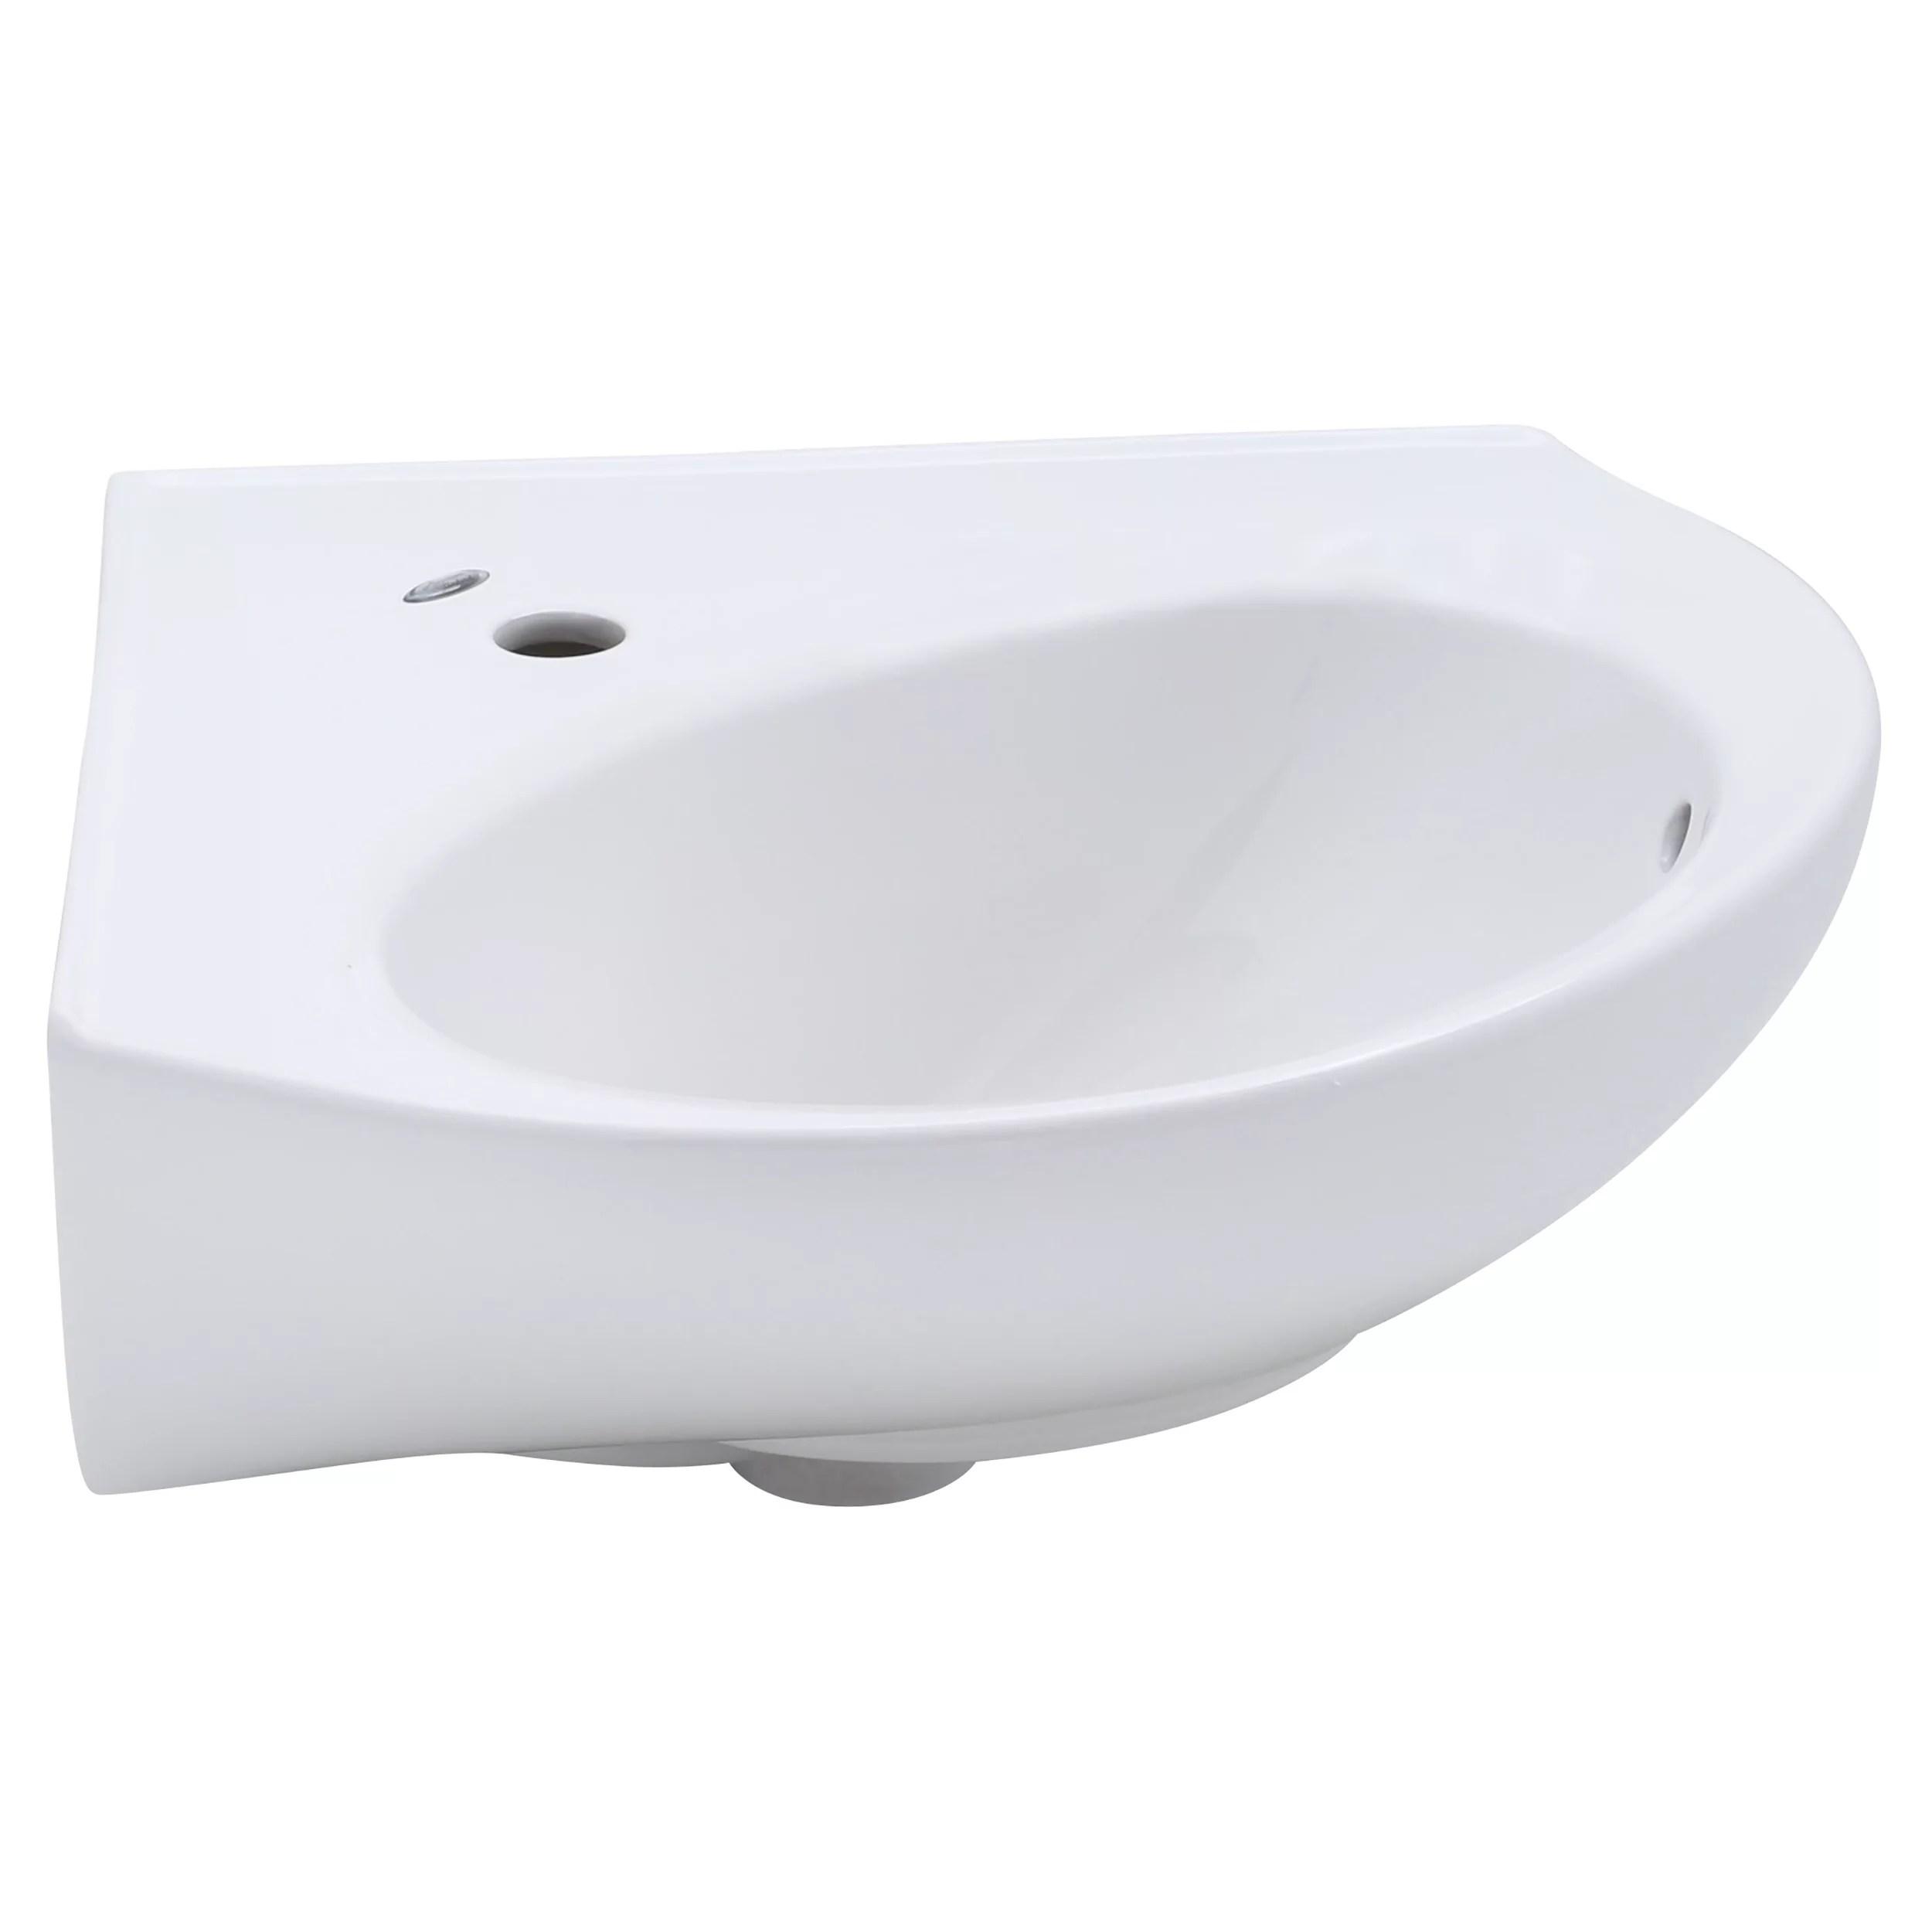 american standard cornice corner pedestal sink top with single hole in white walmart com